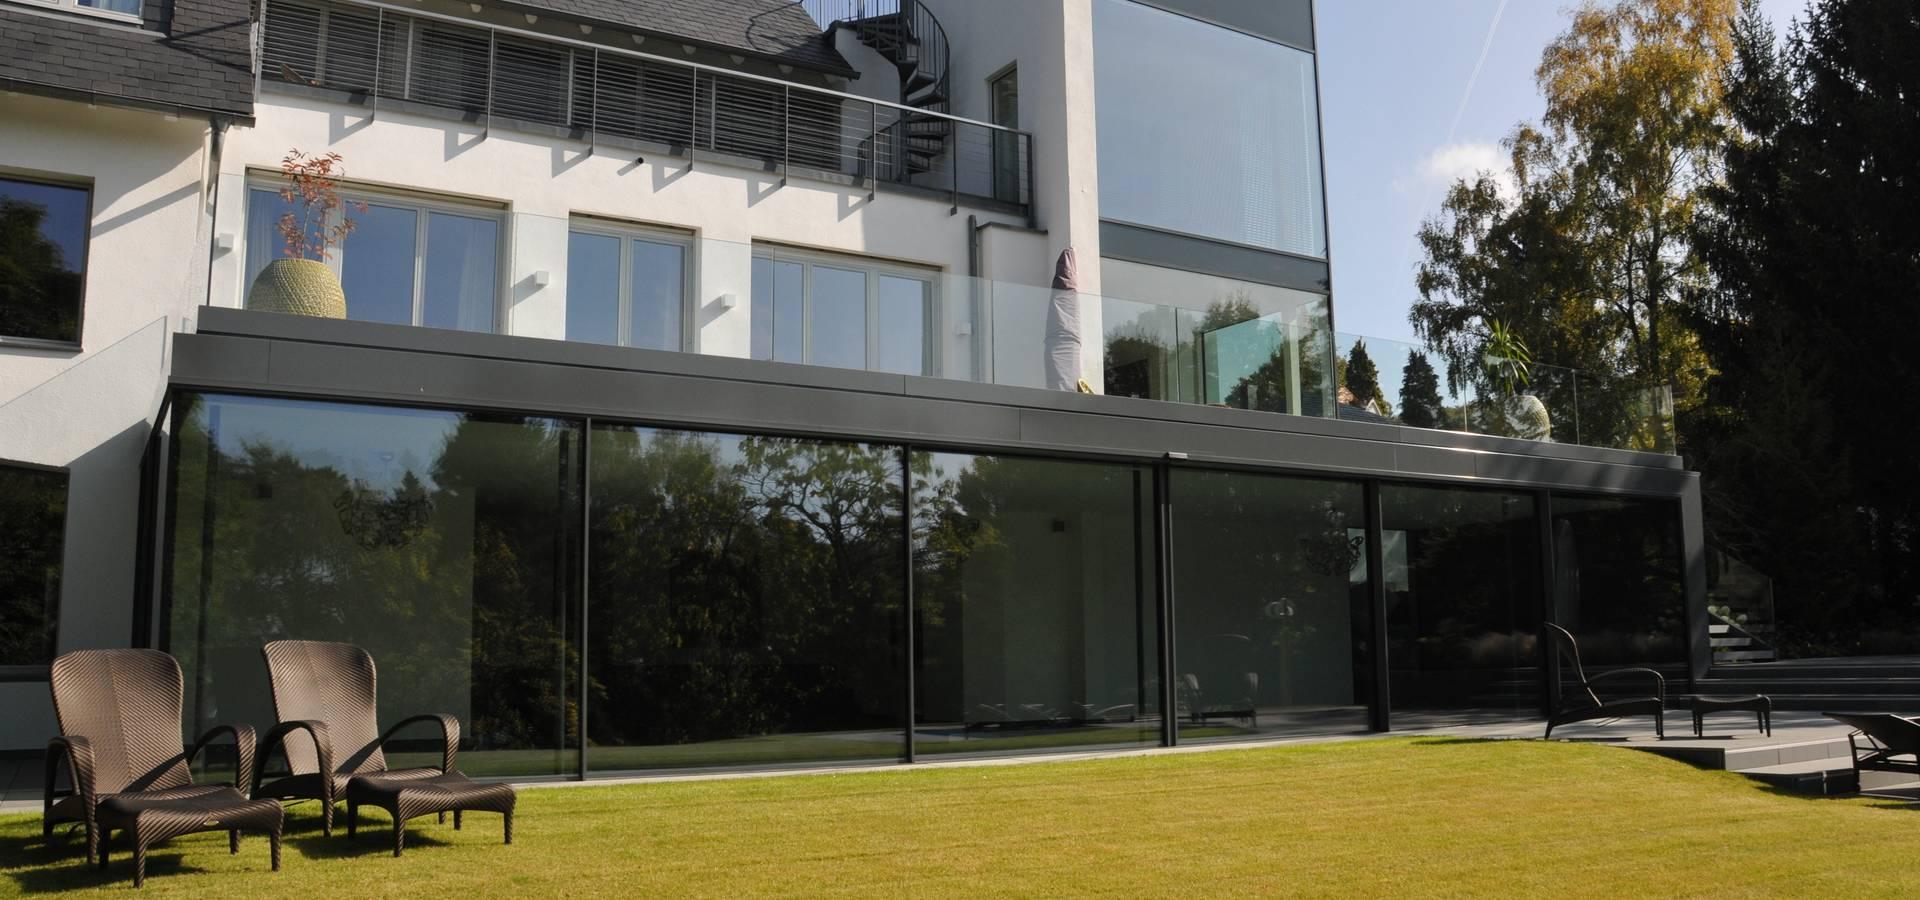 metallbau beilmann gmbh villa im bauhausstil f r okal homify. Black Bedroom Furniture Sets. Home Design Ideas